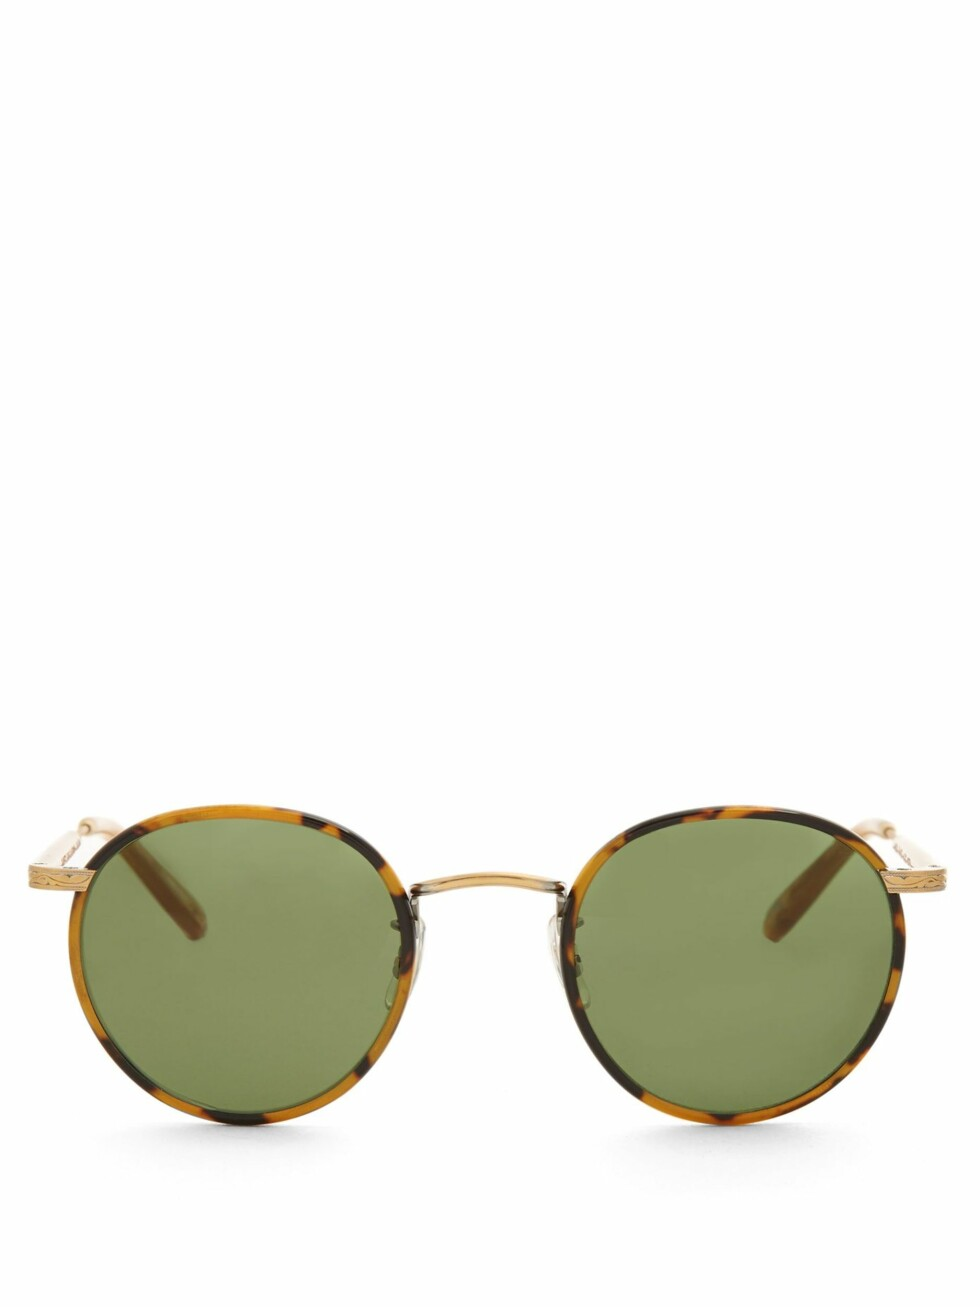 Solbriller fra Garrett Leight |2365,-| https://www.matchesfashion.com/intl/products/Garrett-Leight-Wilson-46-round-frame-sunglasses-1199277